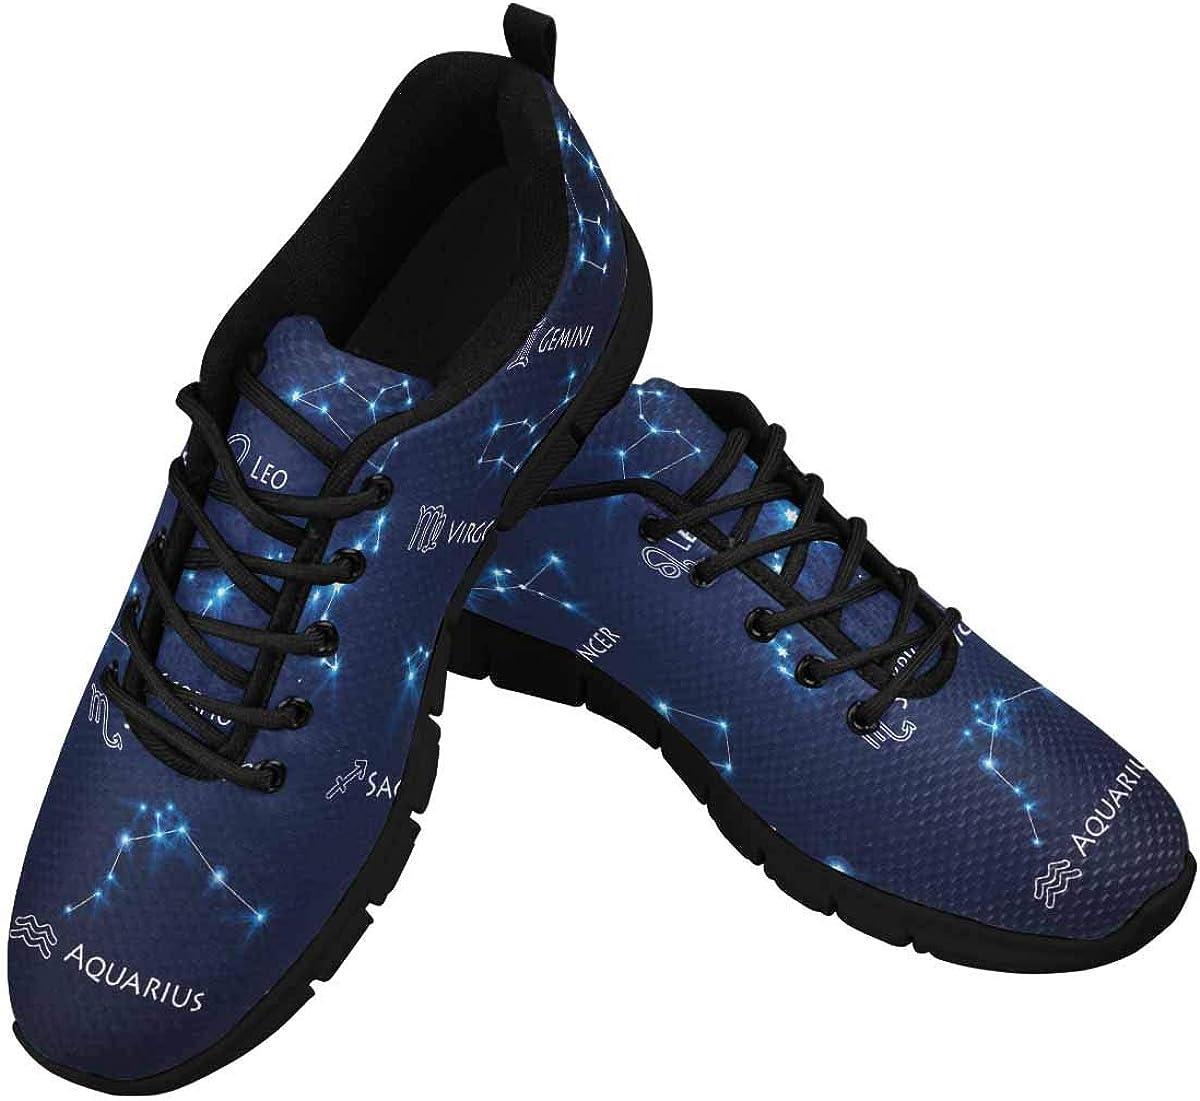 INTERESTPRINT Zodiac Horoscope Set Women's Lightweight Athletic Casual Gym Sneakers